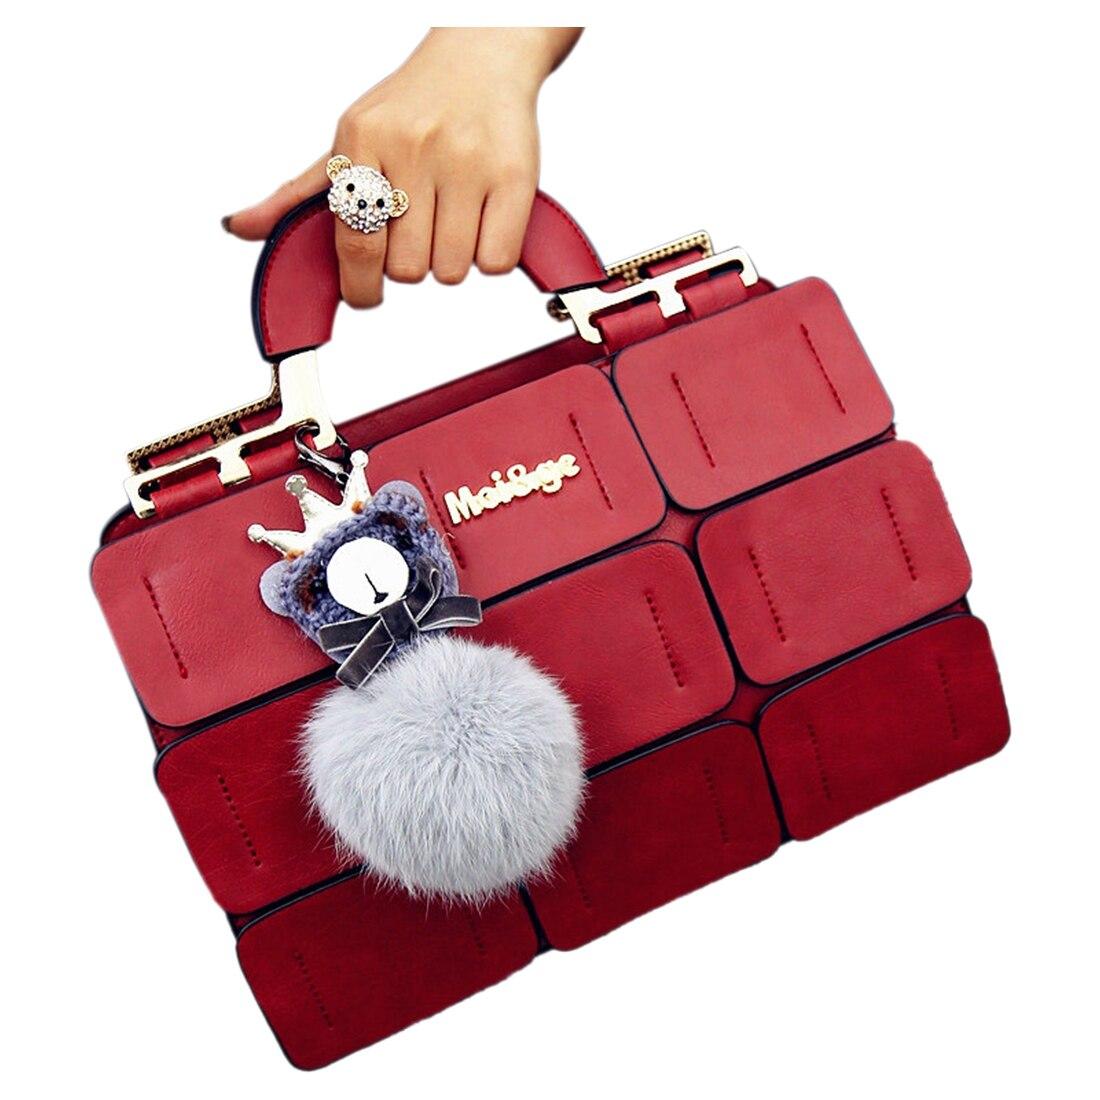 Women Famous Brands Suture Boston Bag Inclined Shoulder Ladies Handbag Women PU leather handbag Woman Bags<br><br>Aliexpress